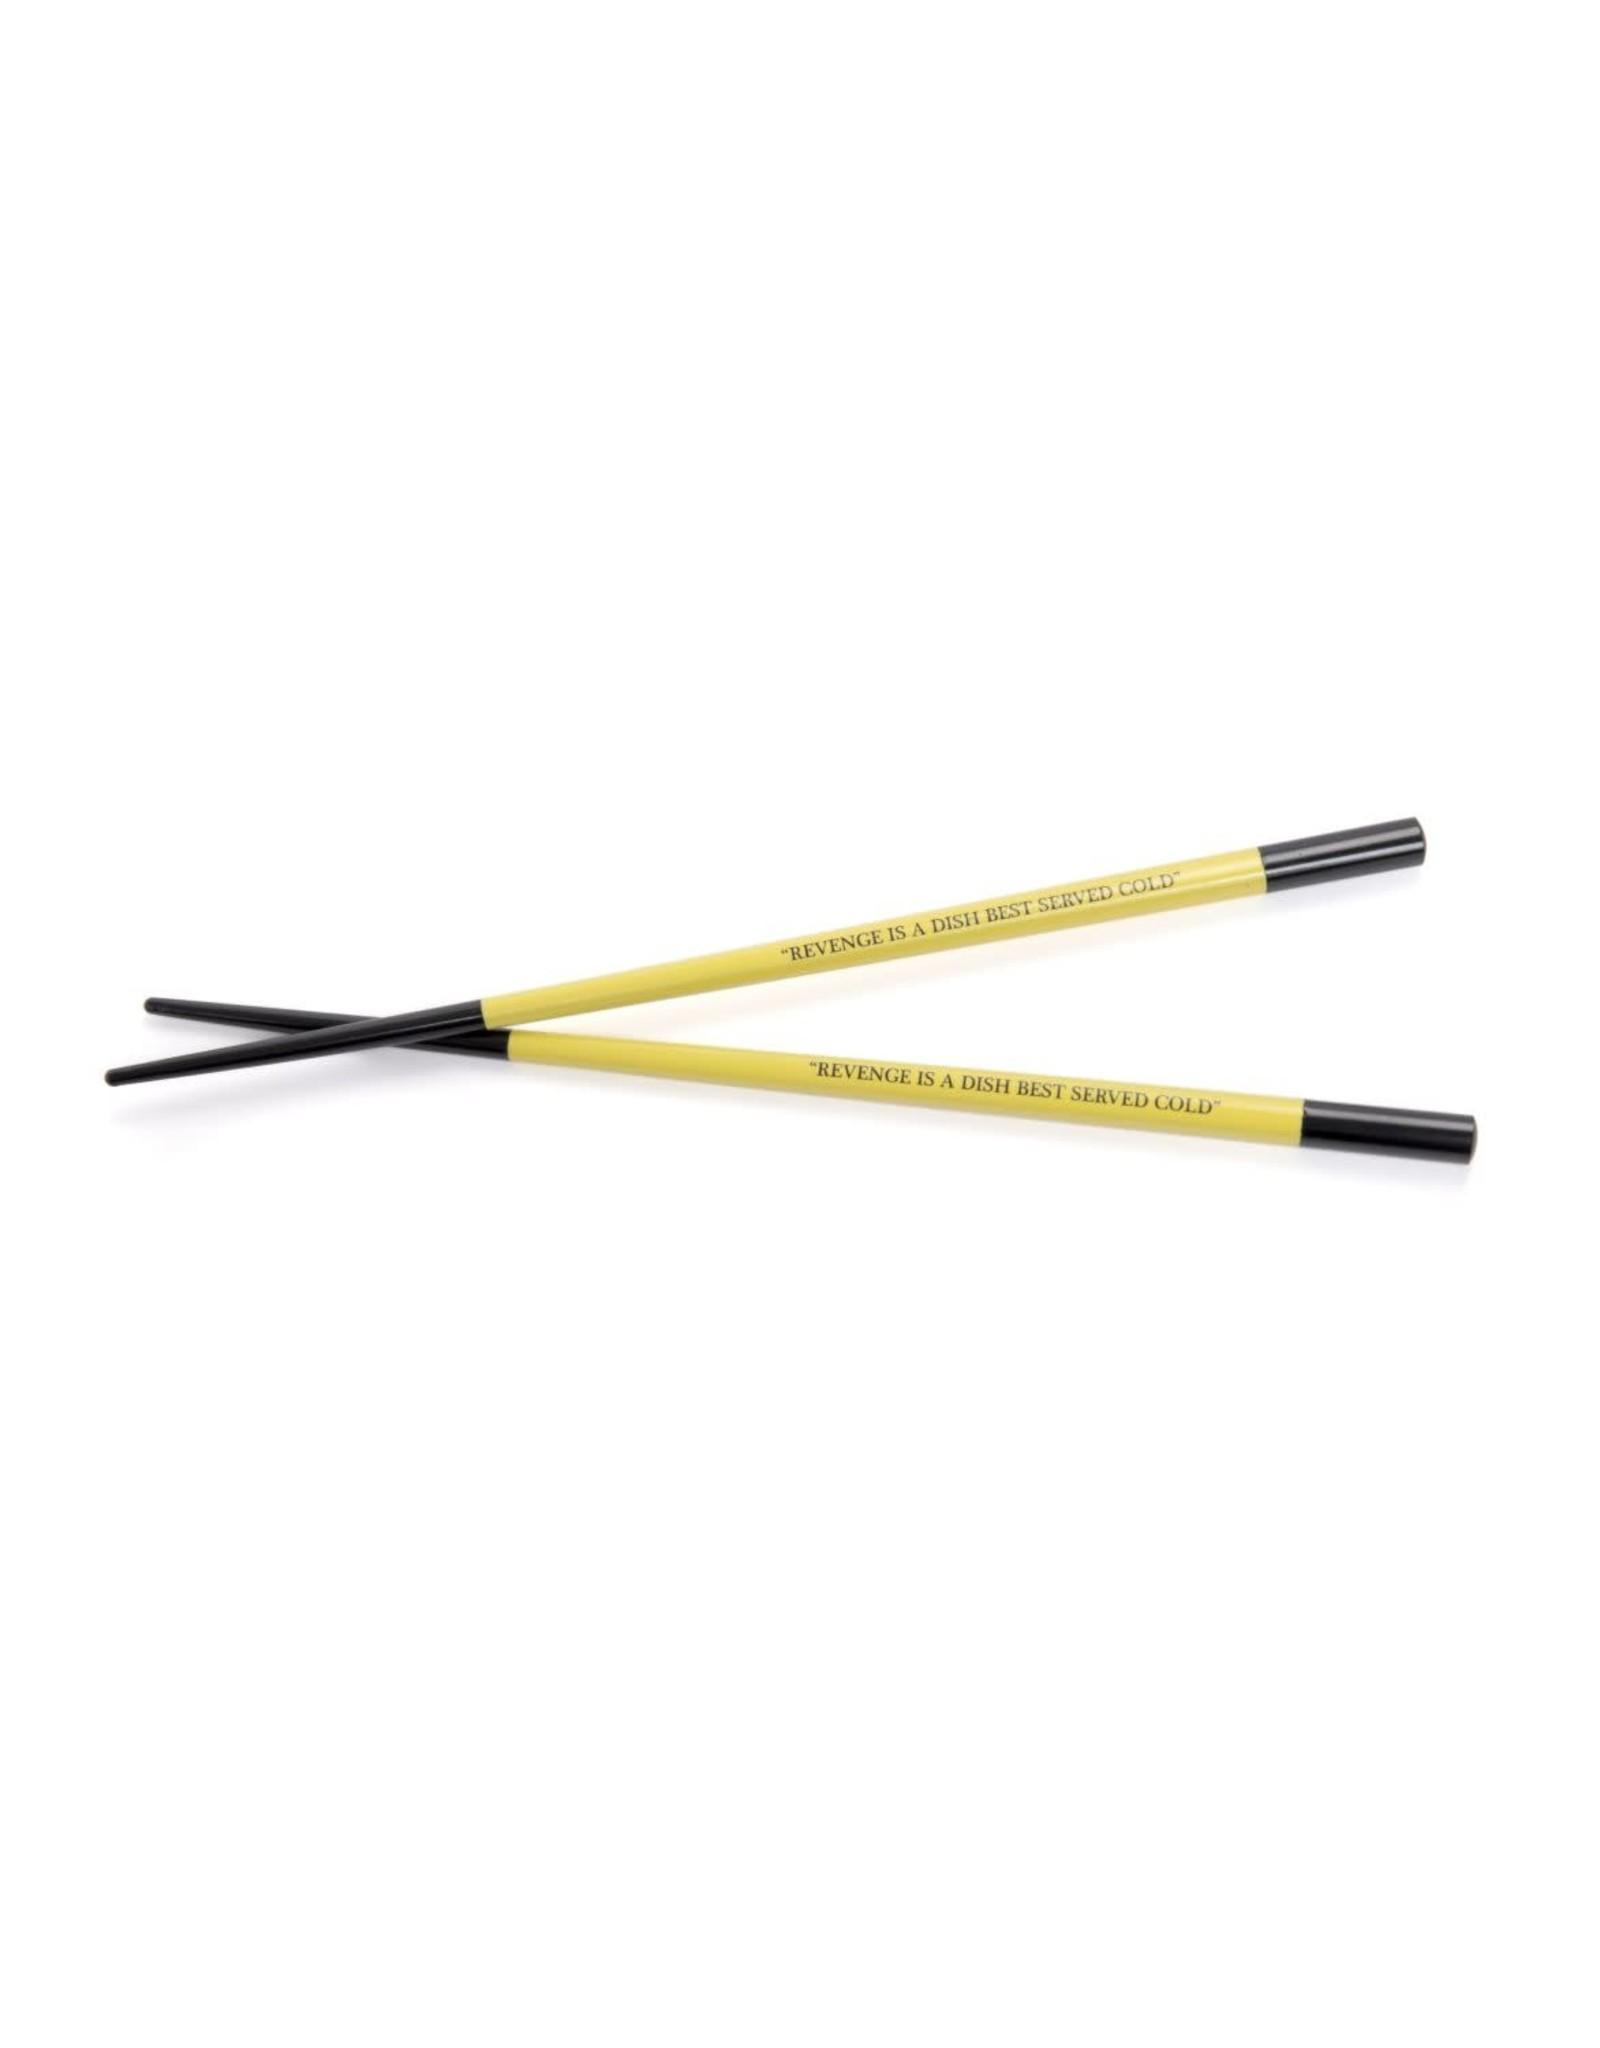 HUF Chopstick